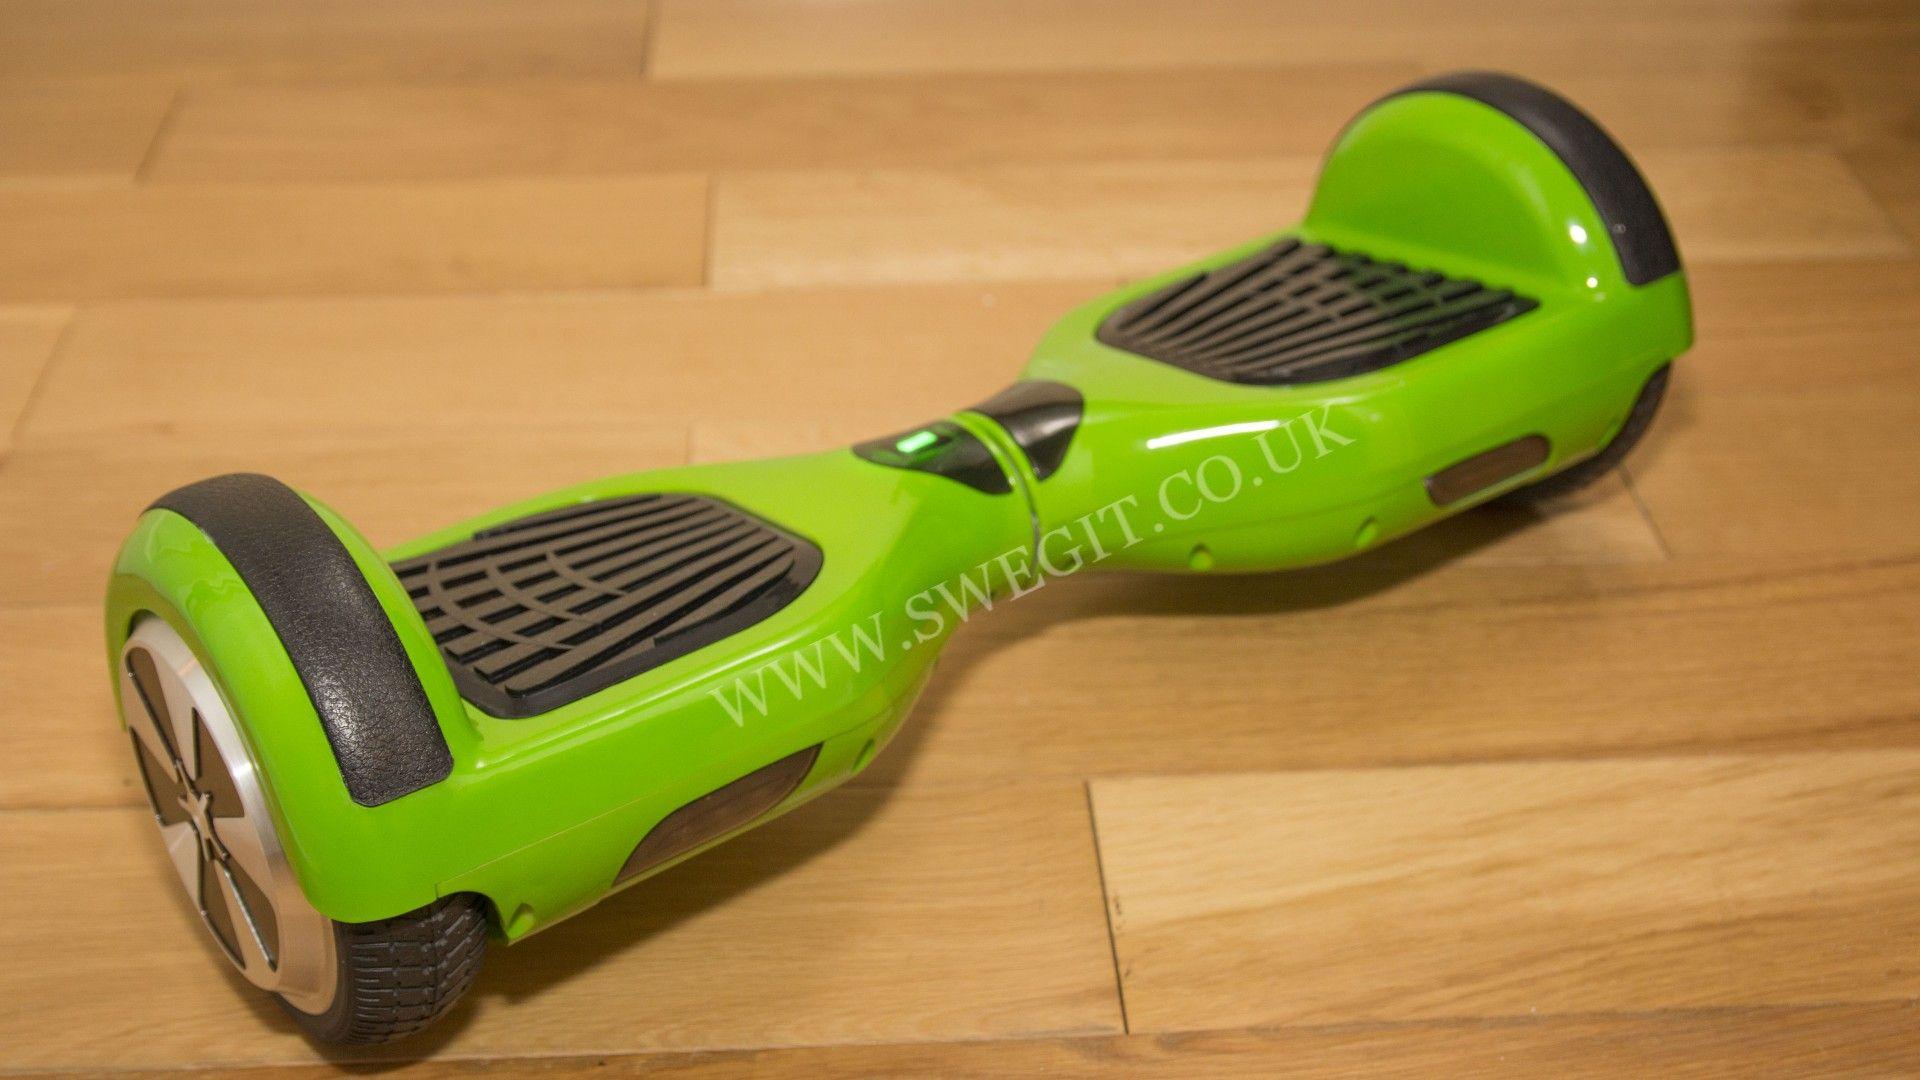 Green Swegit Swegway Front Swegit Swegway Hoverboard Megaboard Uk London Cheap Segway